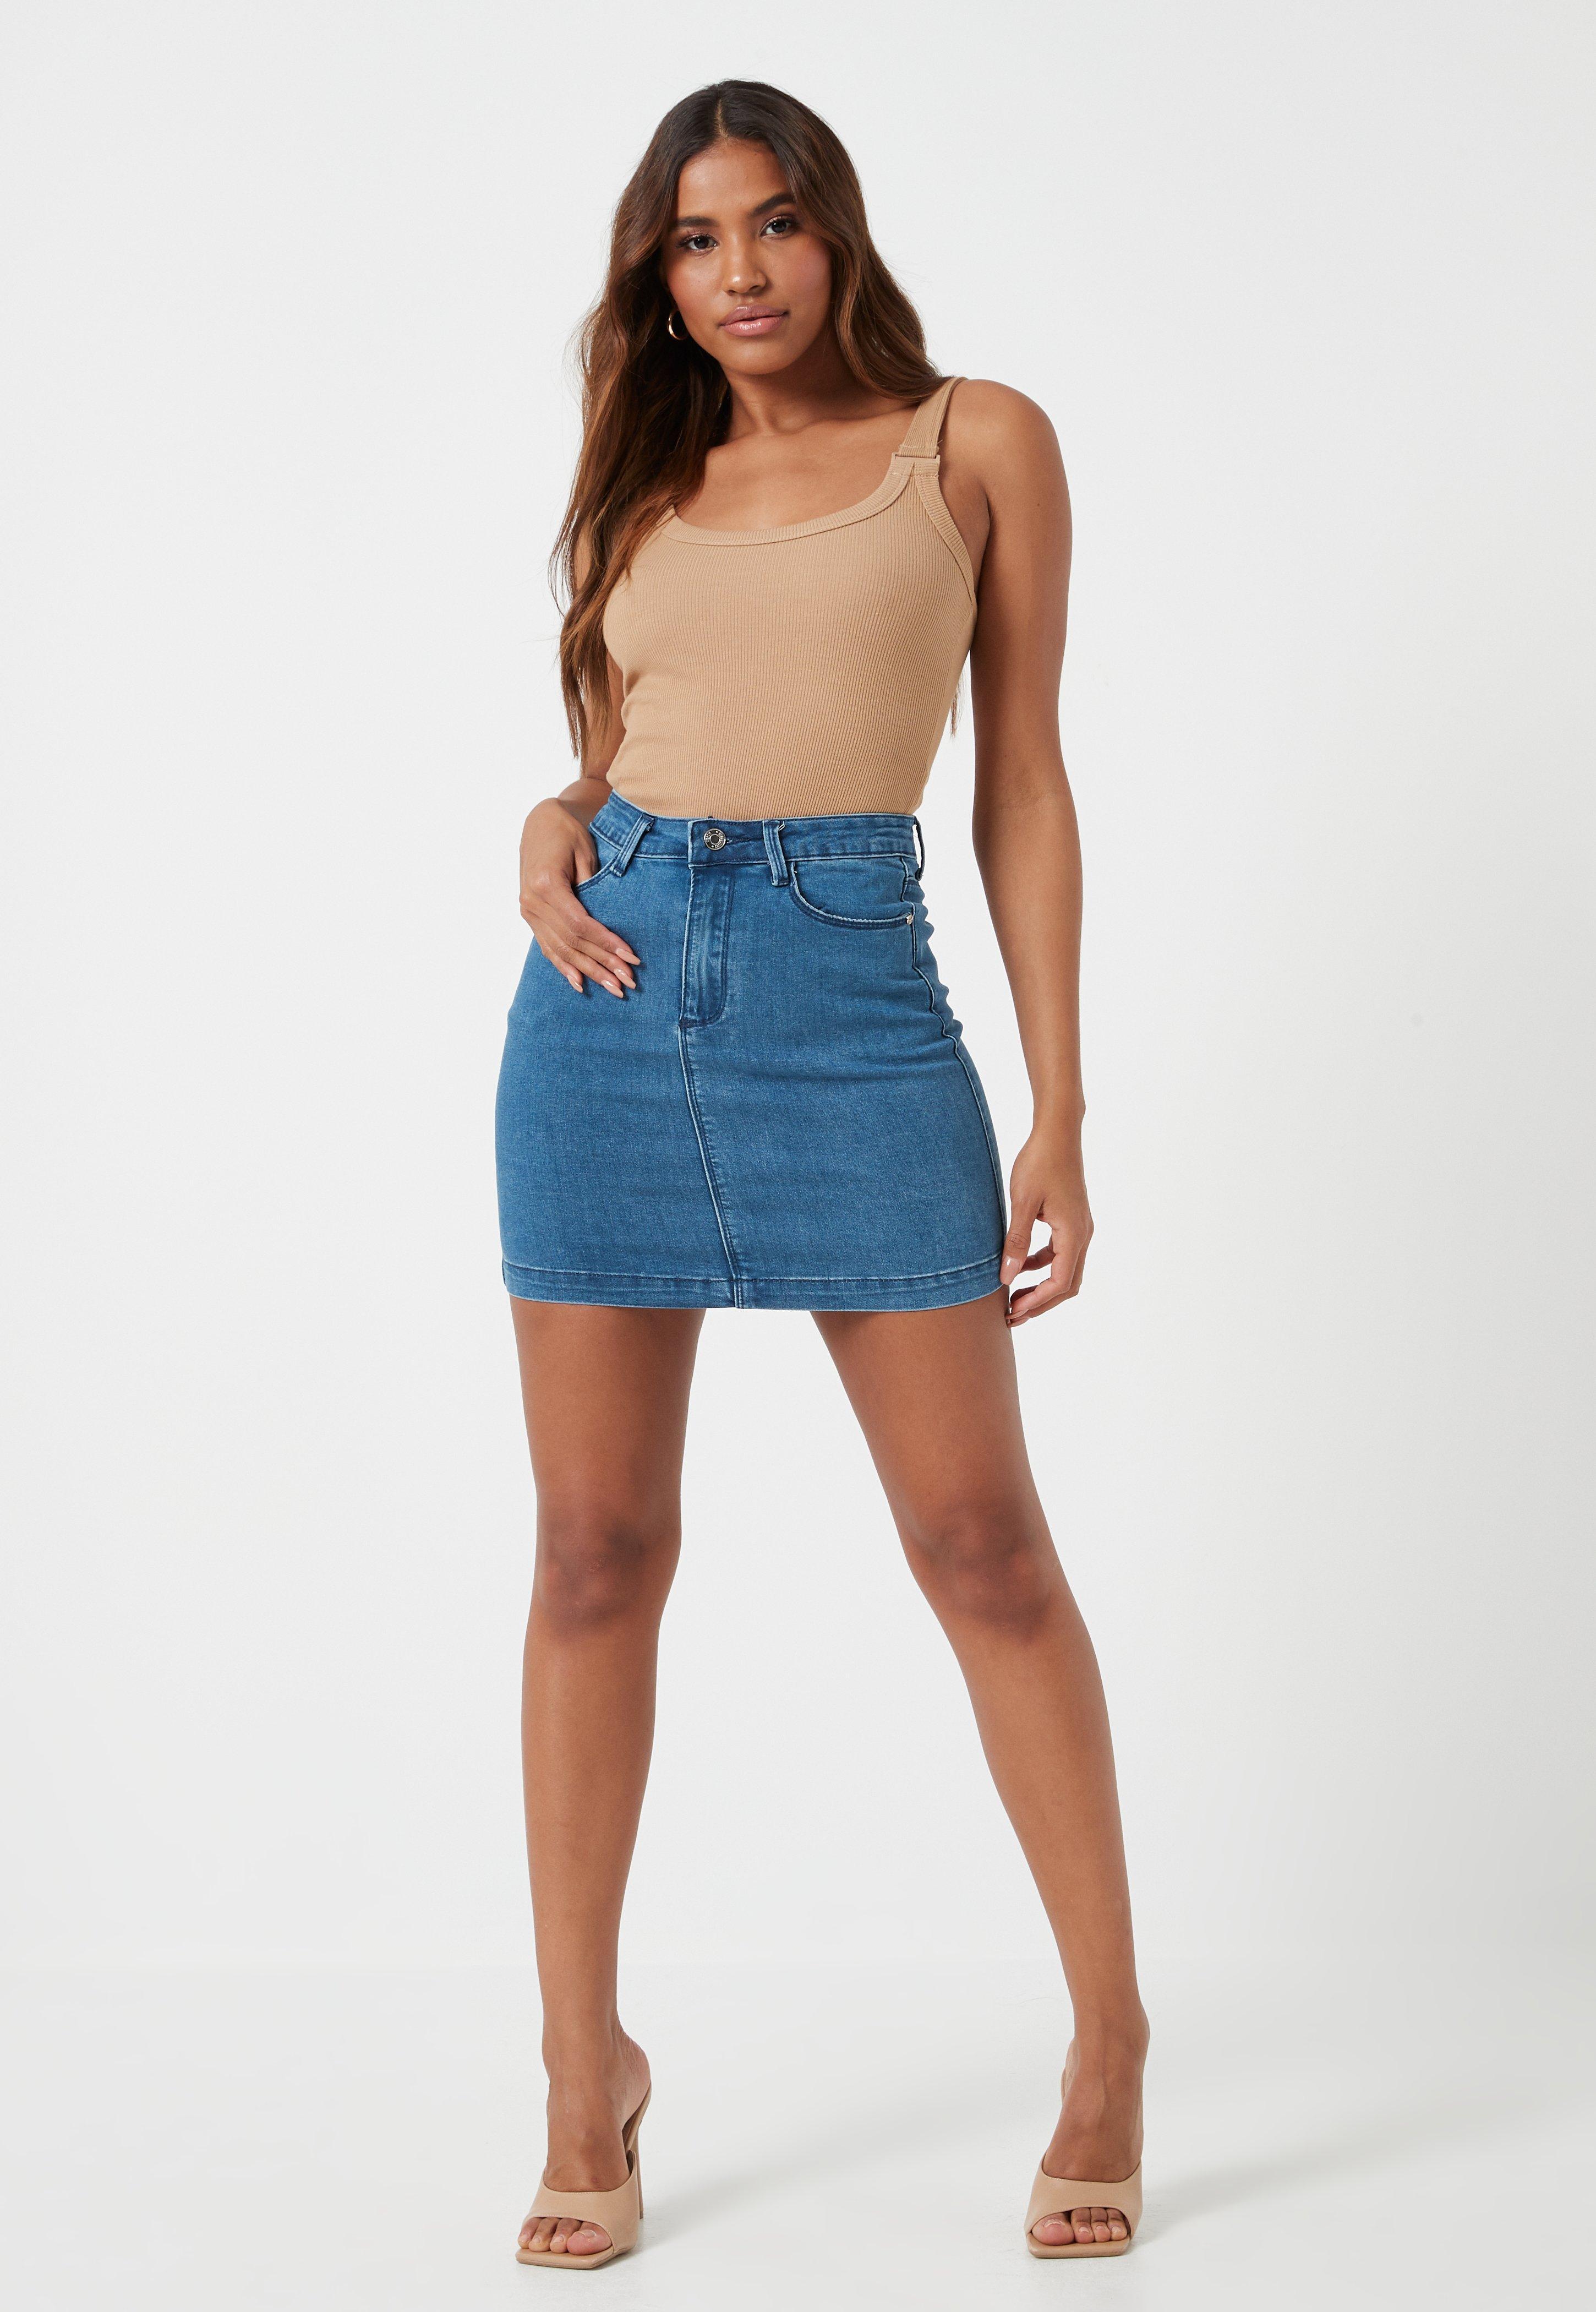 Missguided Denim Mini Skirt Discount Shop For dyuCNuyTrj